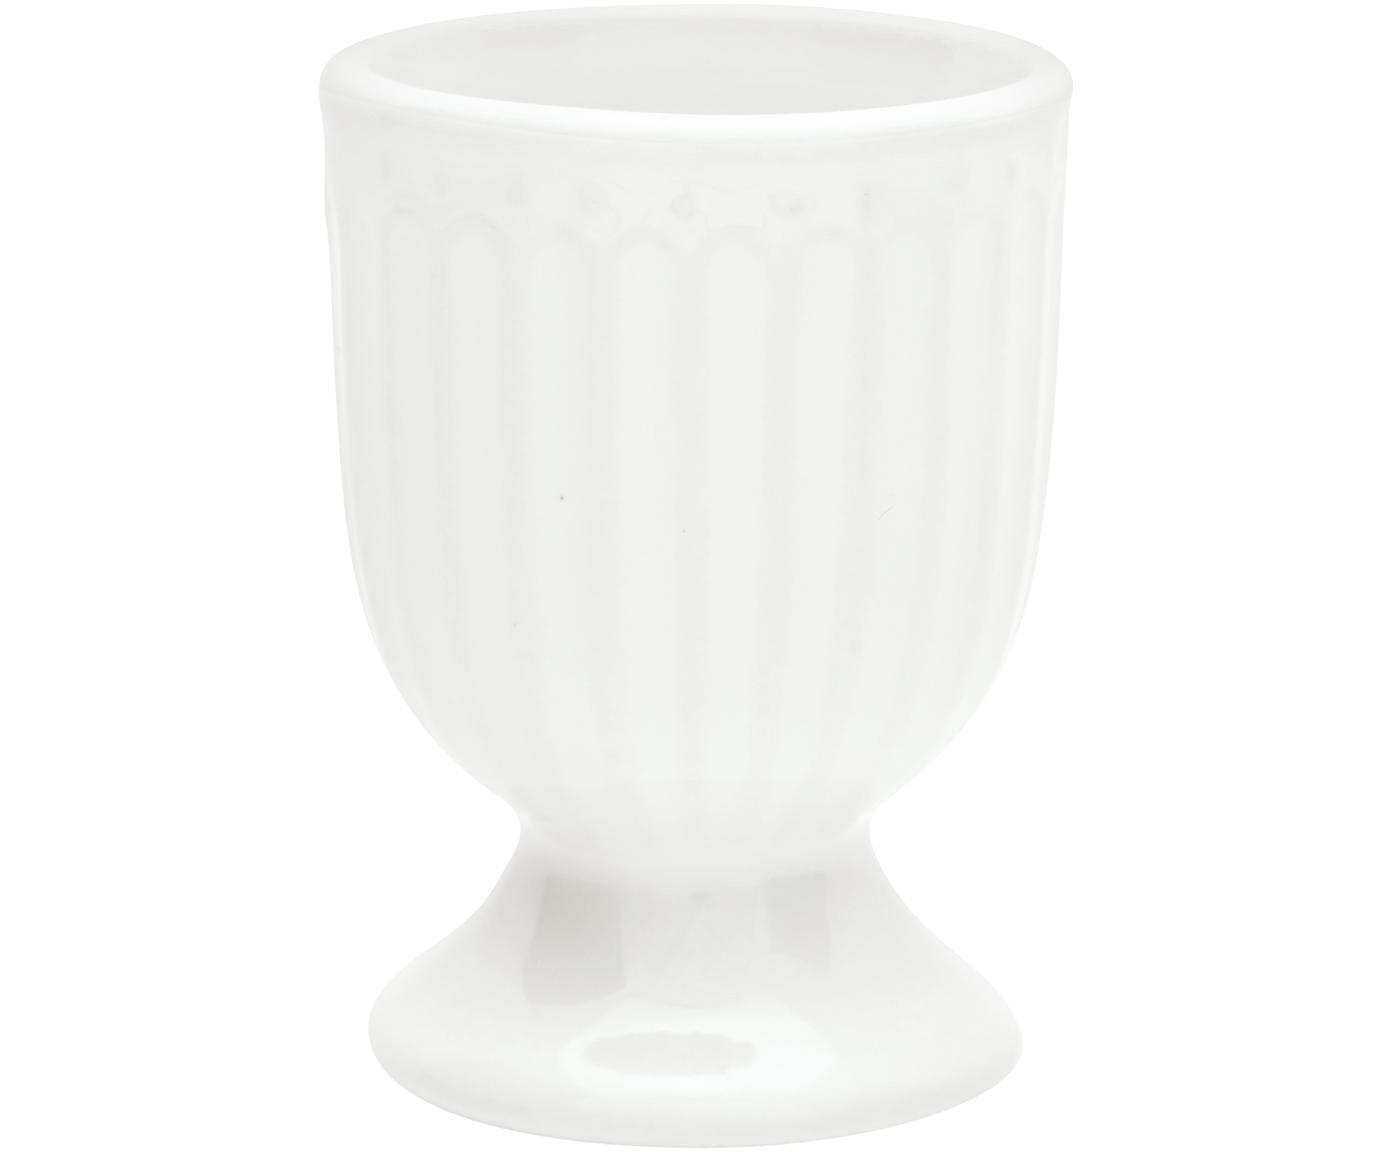 Eierdopje Alice, 2 stuks, Porselein, Wit, Ø 5 x H 7 cm